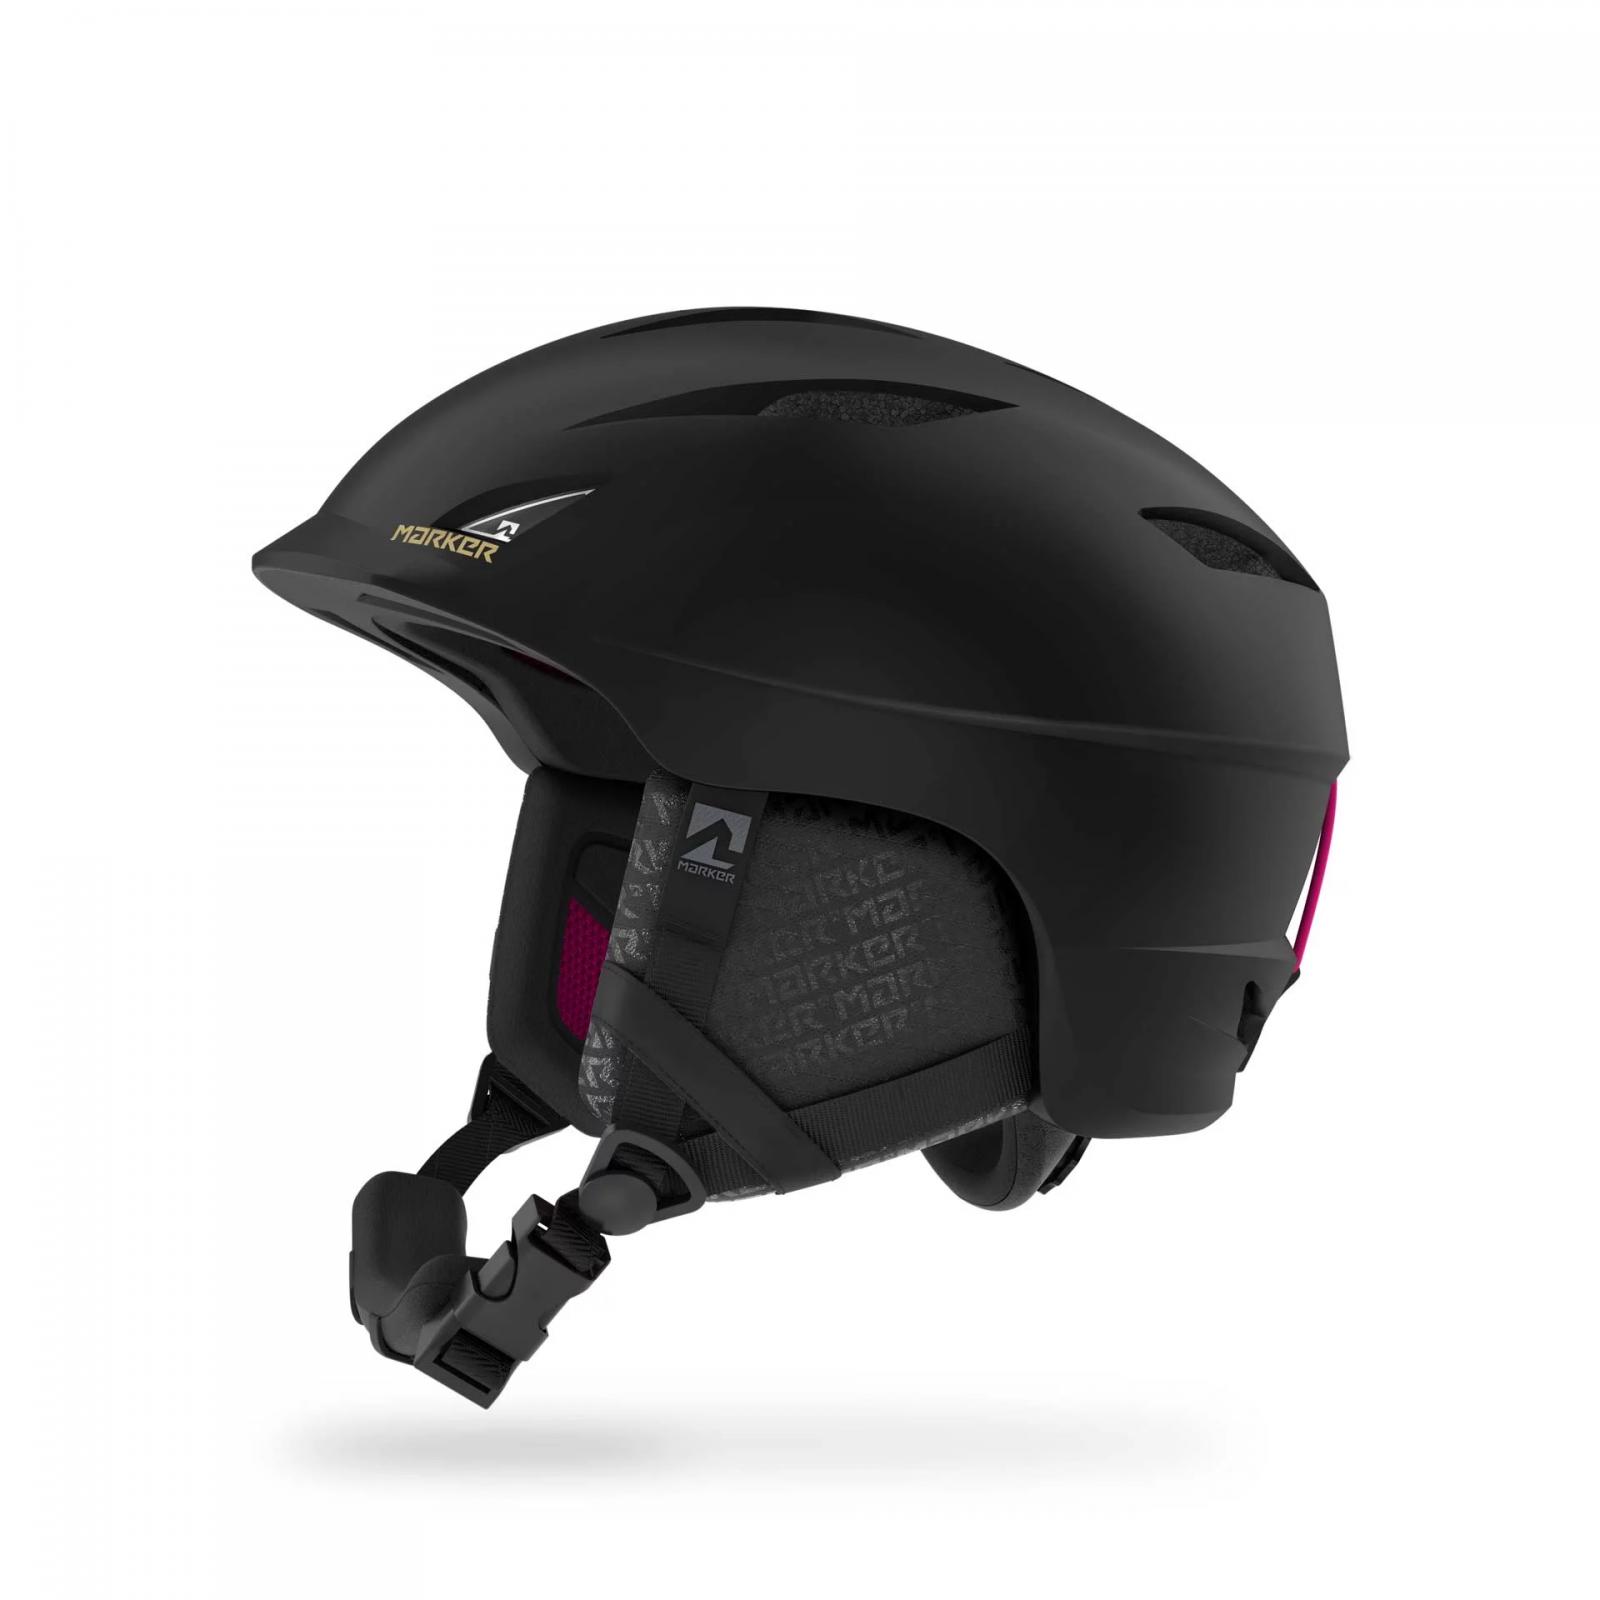 Marker Companion W Helmet 2021